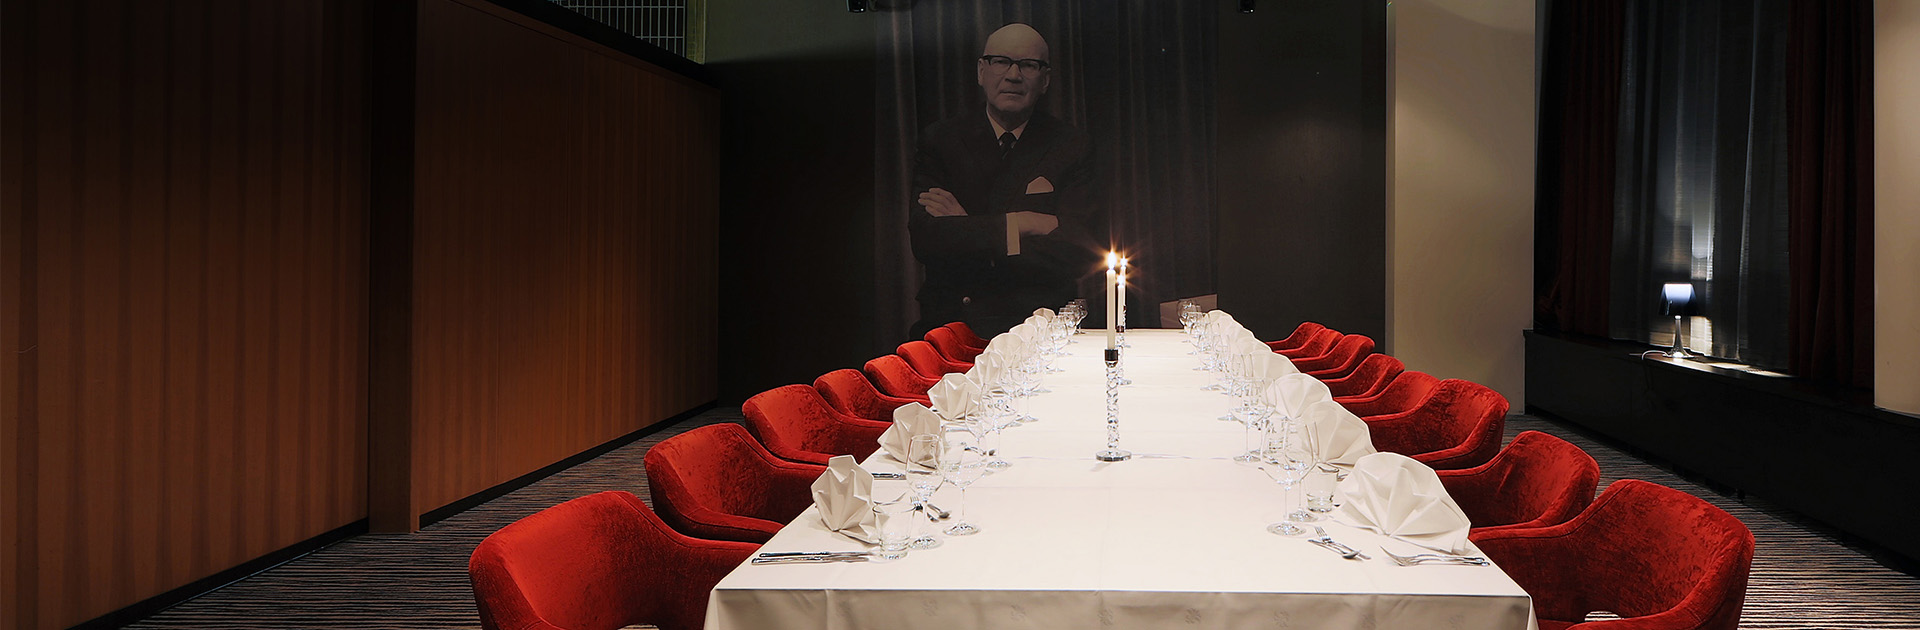 Långvikin Kekkoslounge kokous- ja juhlatila